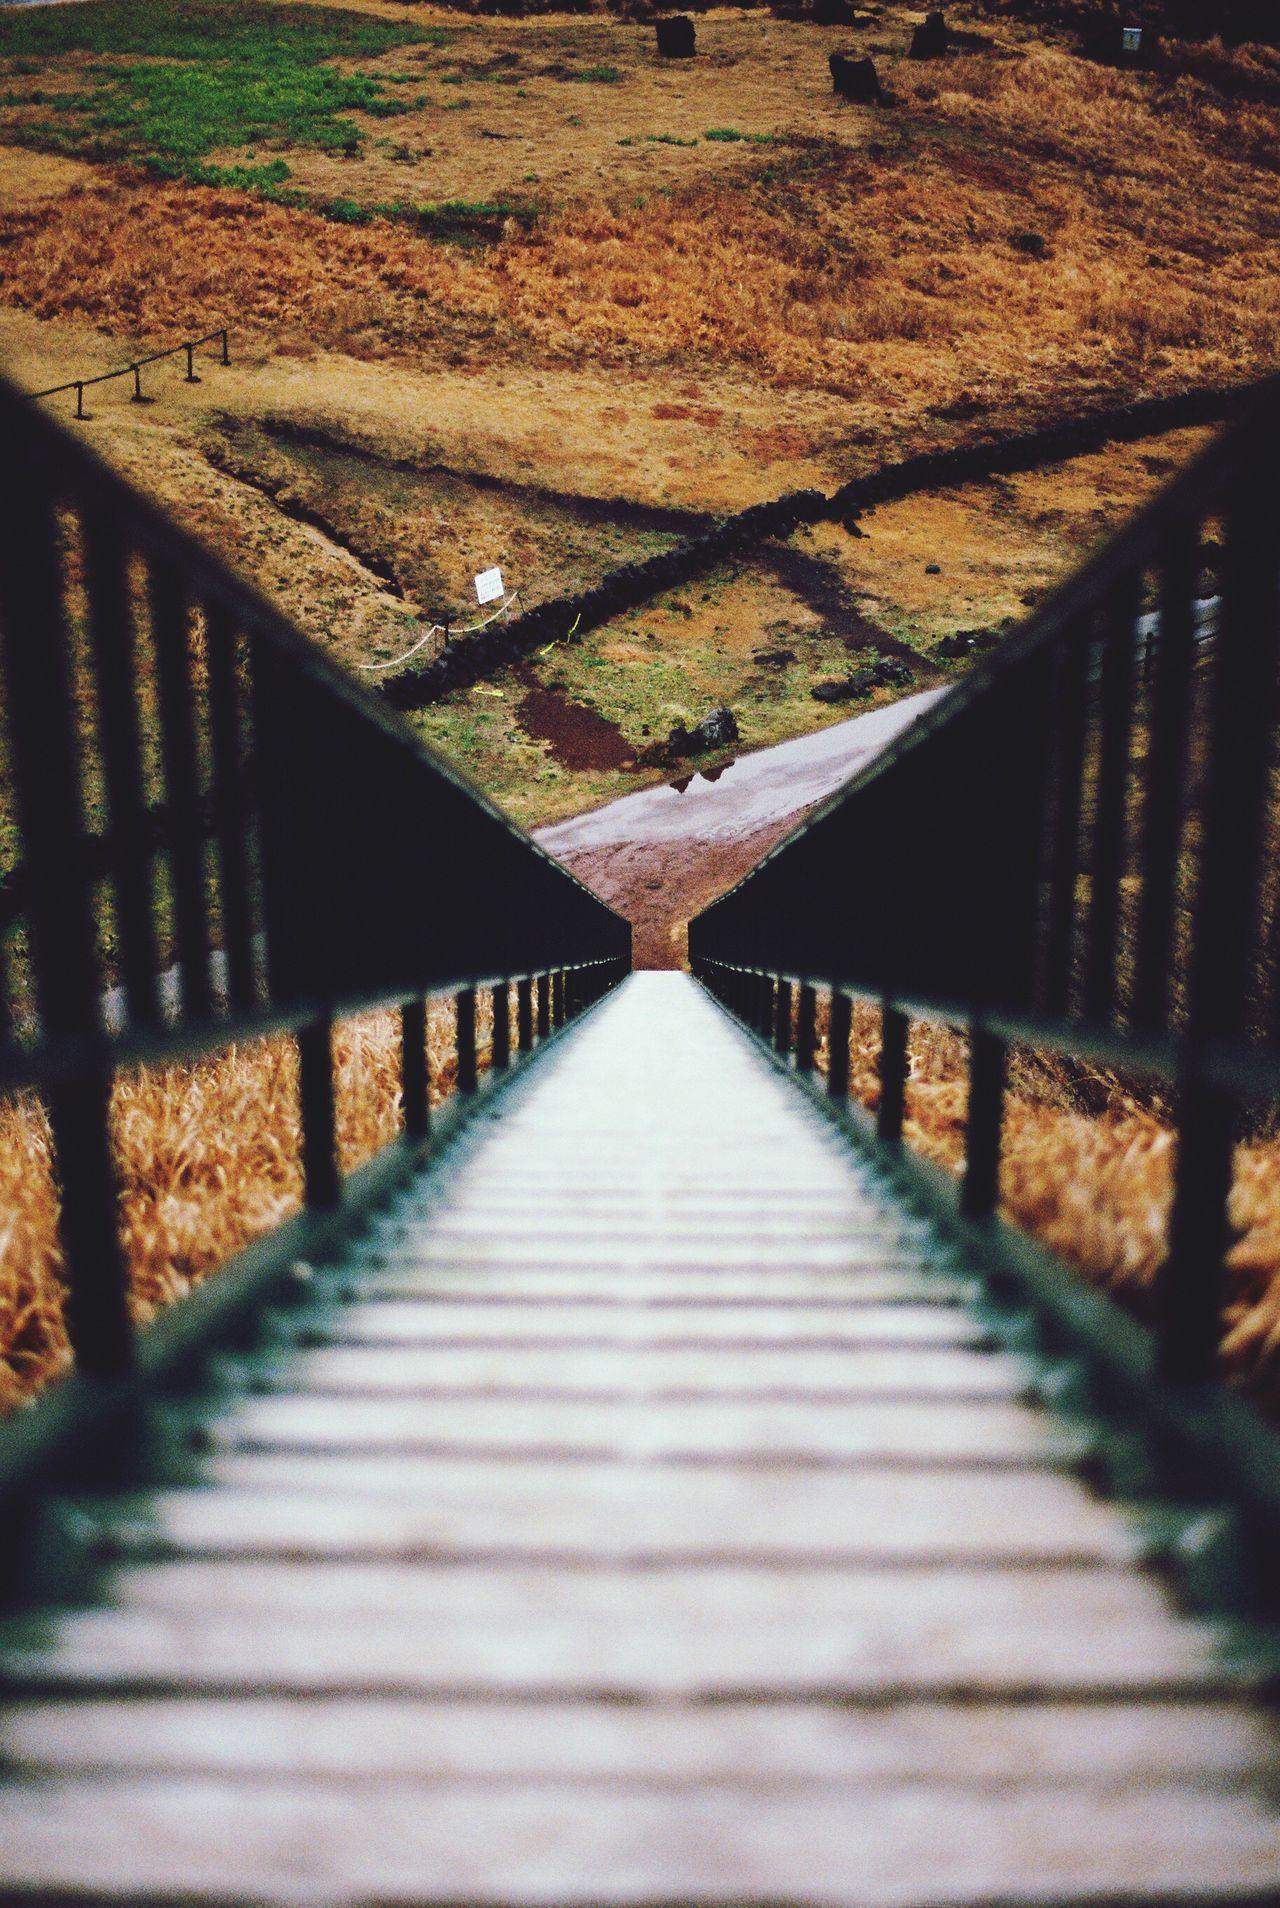 The Architect - 2017 EyeEm Awards The Way Forward Footbridge Day No People Nature Daytime EyeEmNewHere EyeEm Best Shots Landscape JEJU ISLAND  Jeju Island, Korea Trevel Viewpoint Film Photography Film Lifestyles Beauty In Nature